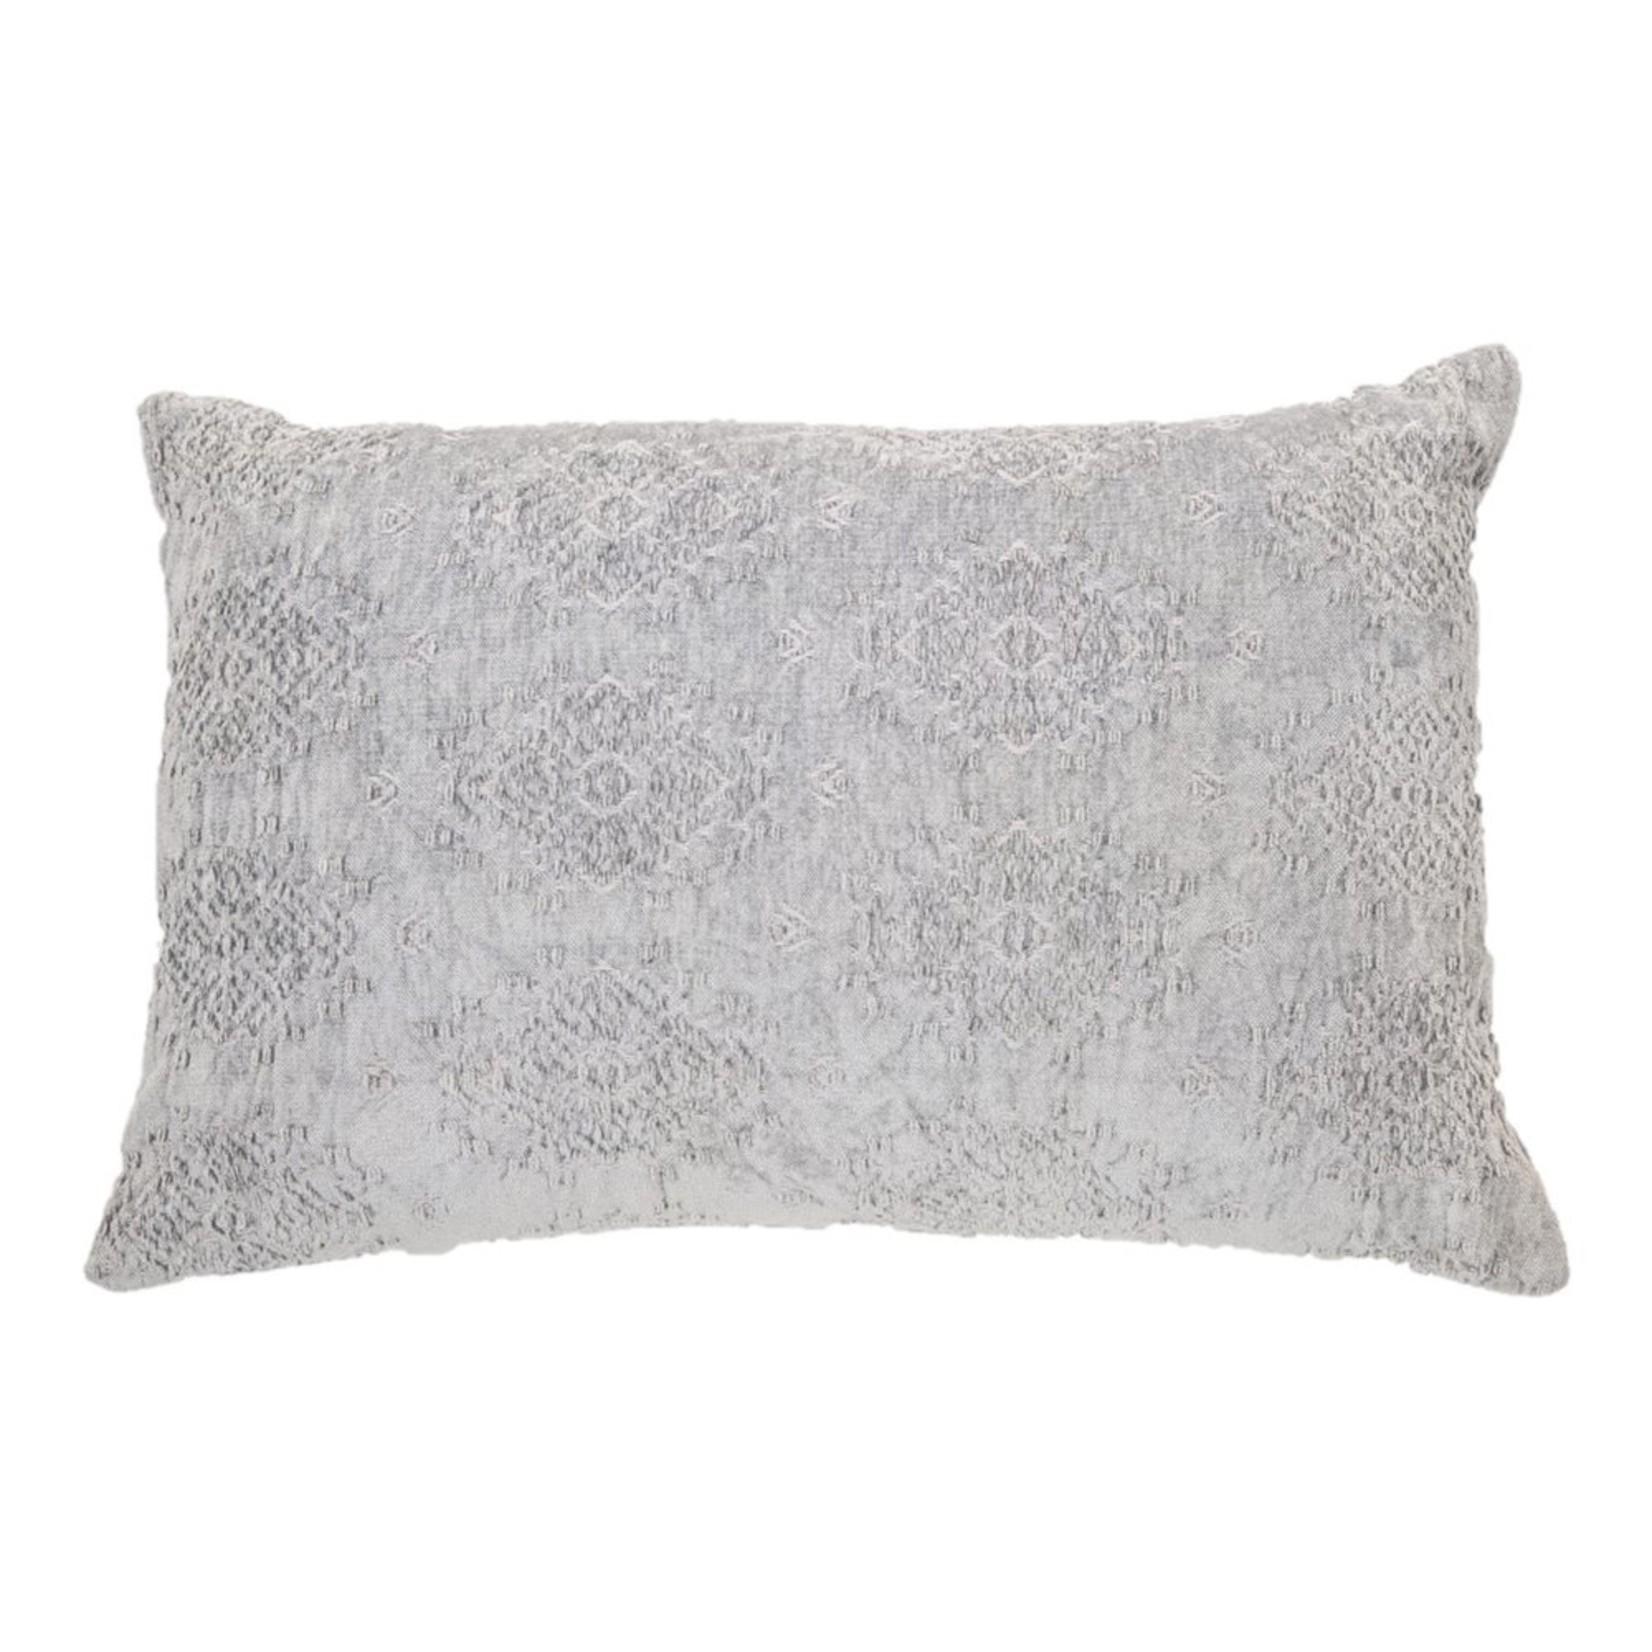 Brunelli Toro Cushion